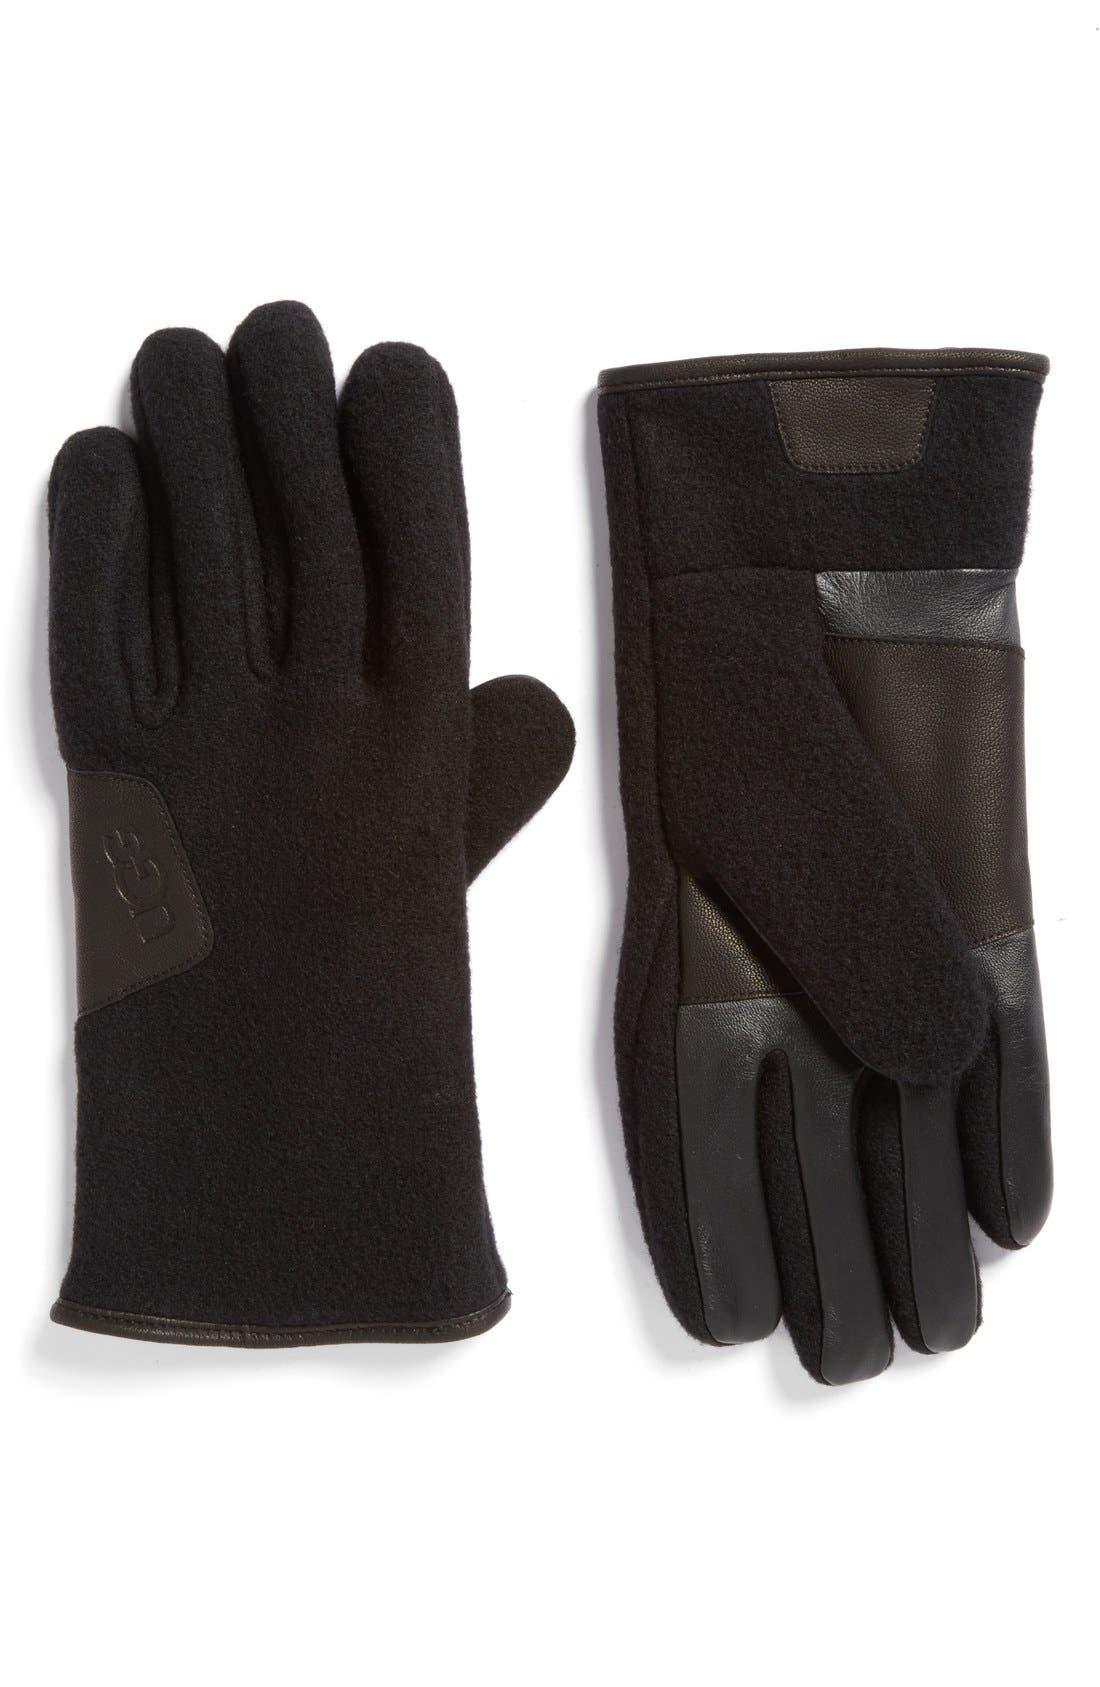 Alternate Image 1 Selected - UGG® Wool Blend Tech Gloves